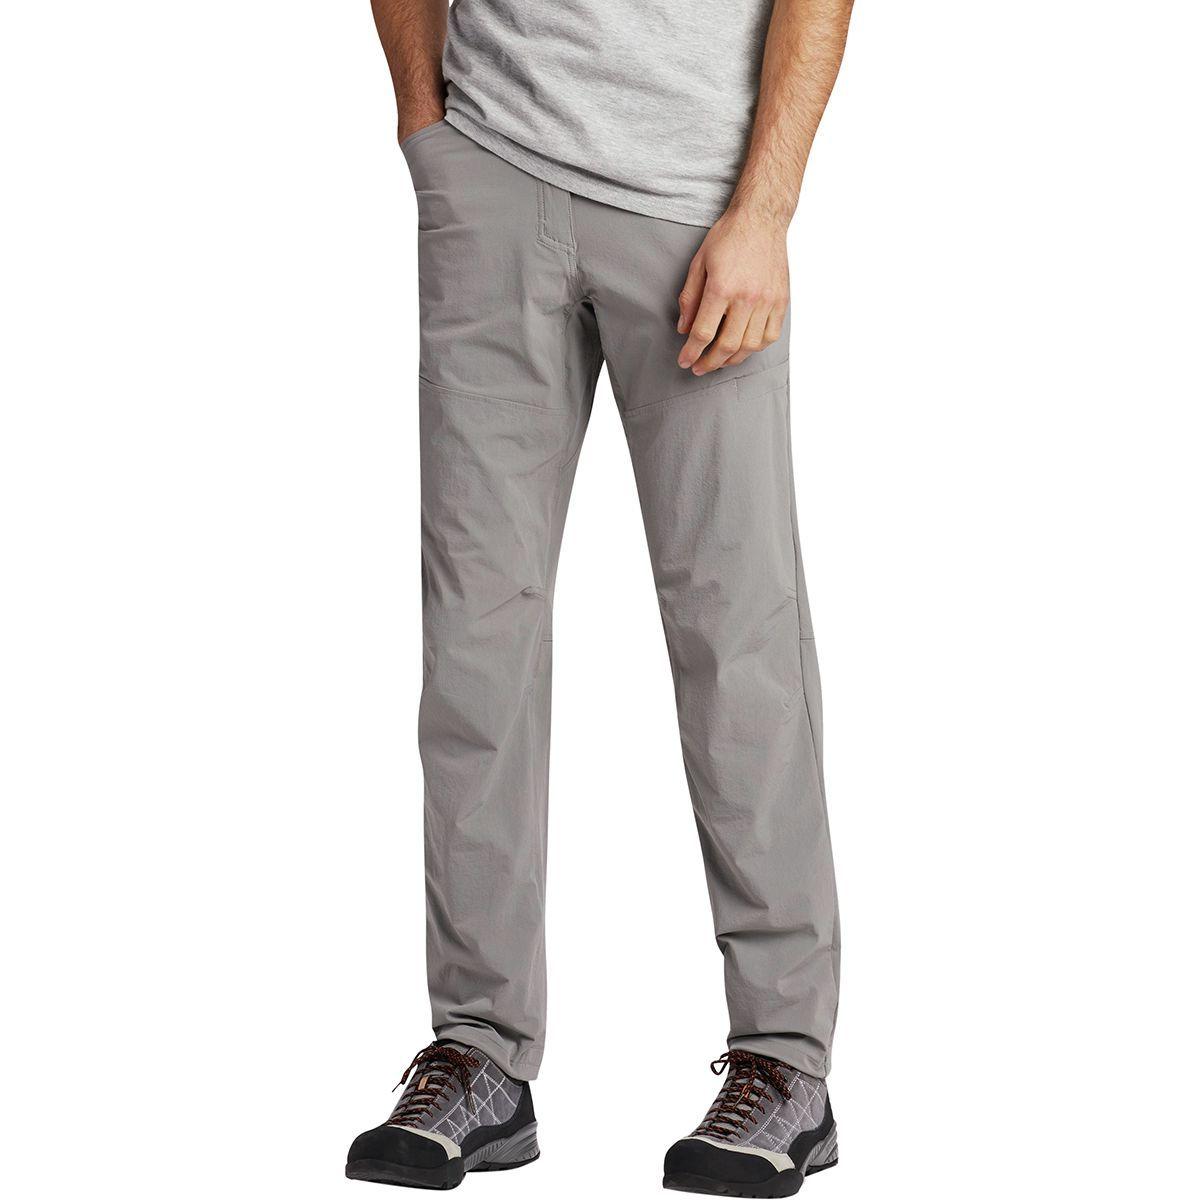 Mountain Hardwear Logan Canyon Pant - Men's